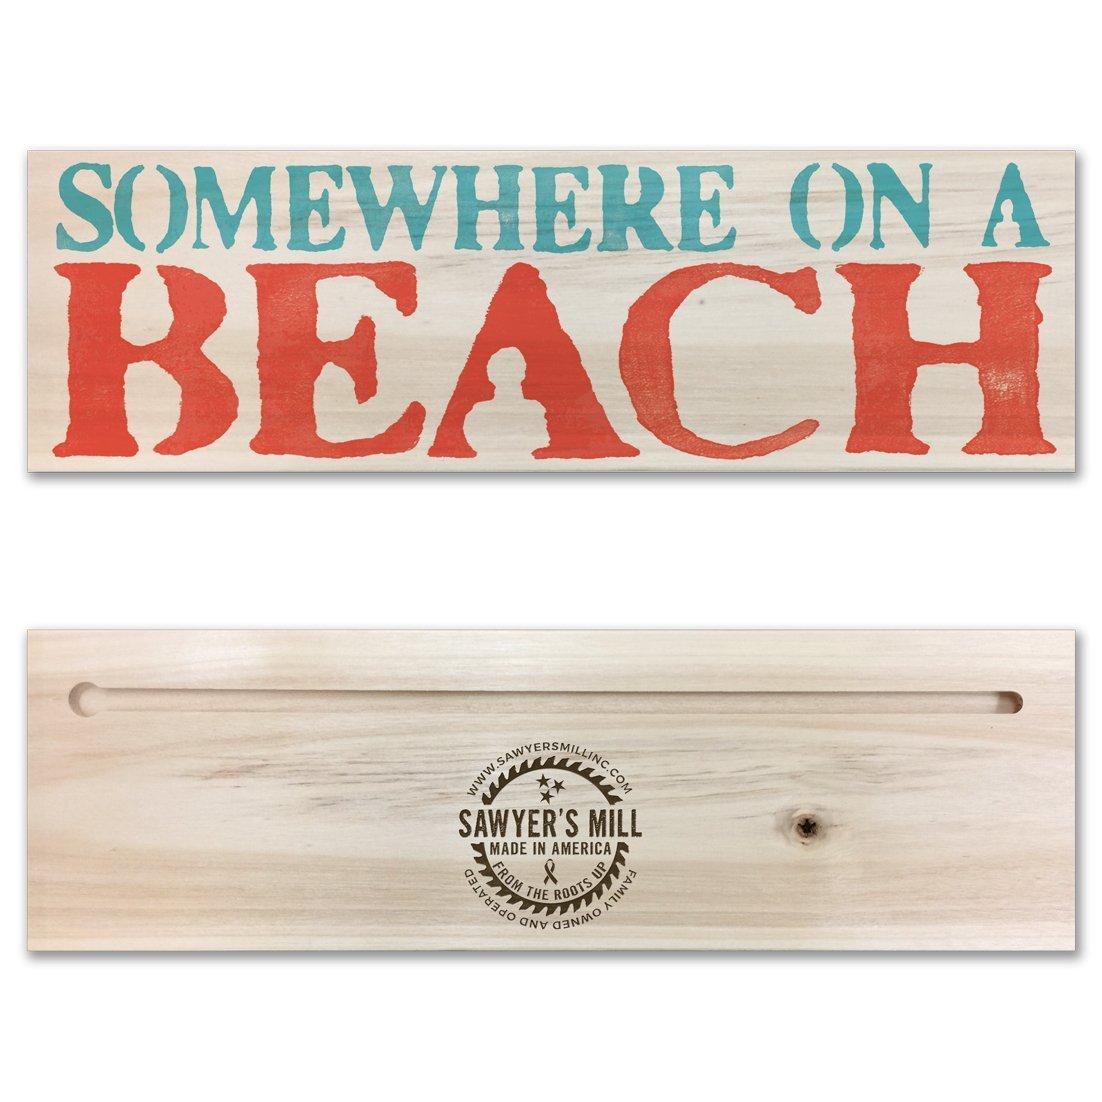 7637eea6f2e345 Amazon.com  Somewhere On A Beach - Handmade Wood Block Sign Inspired by  Dierks Bentley.  Handmade